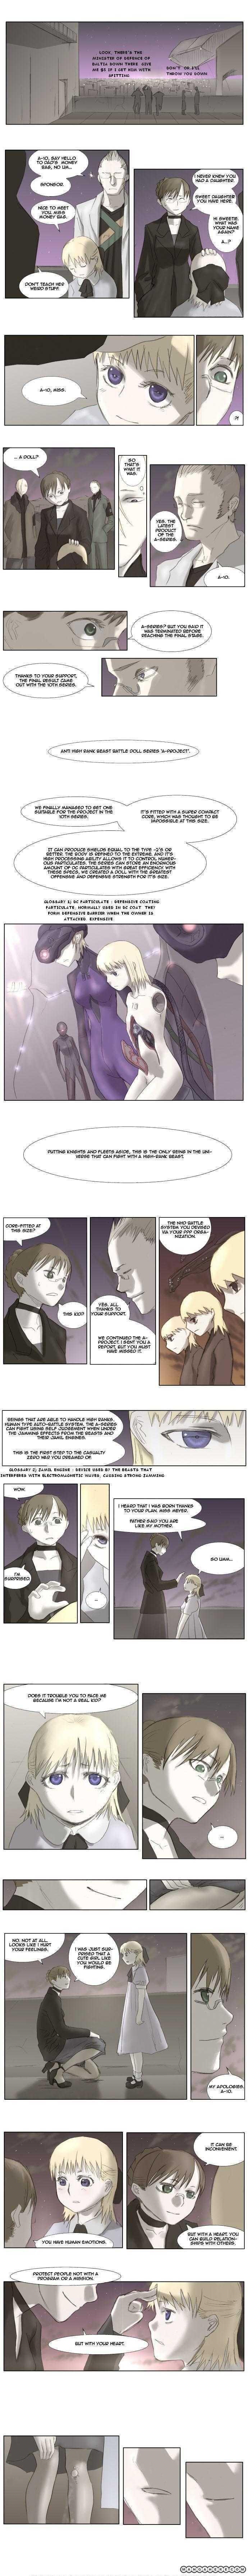 Knight Run 9 Page 3